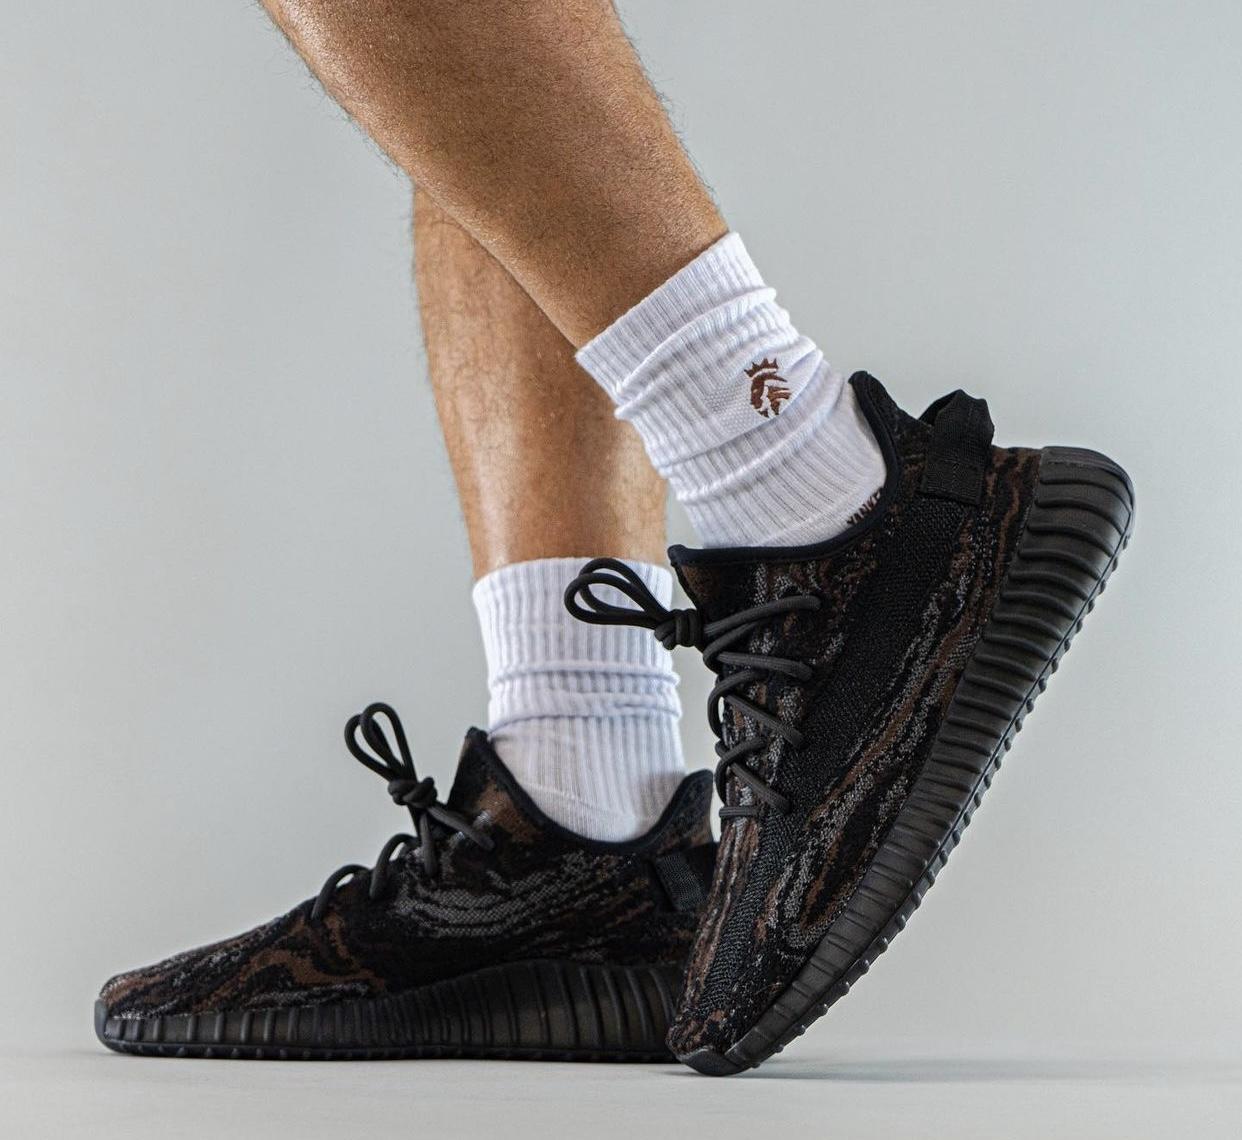 adidas,Yeezy,350 V2,MX Rock  上脚照曝光!全新大理石「黑天使」350 V2 将于 9 月发售!